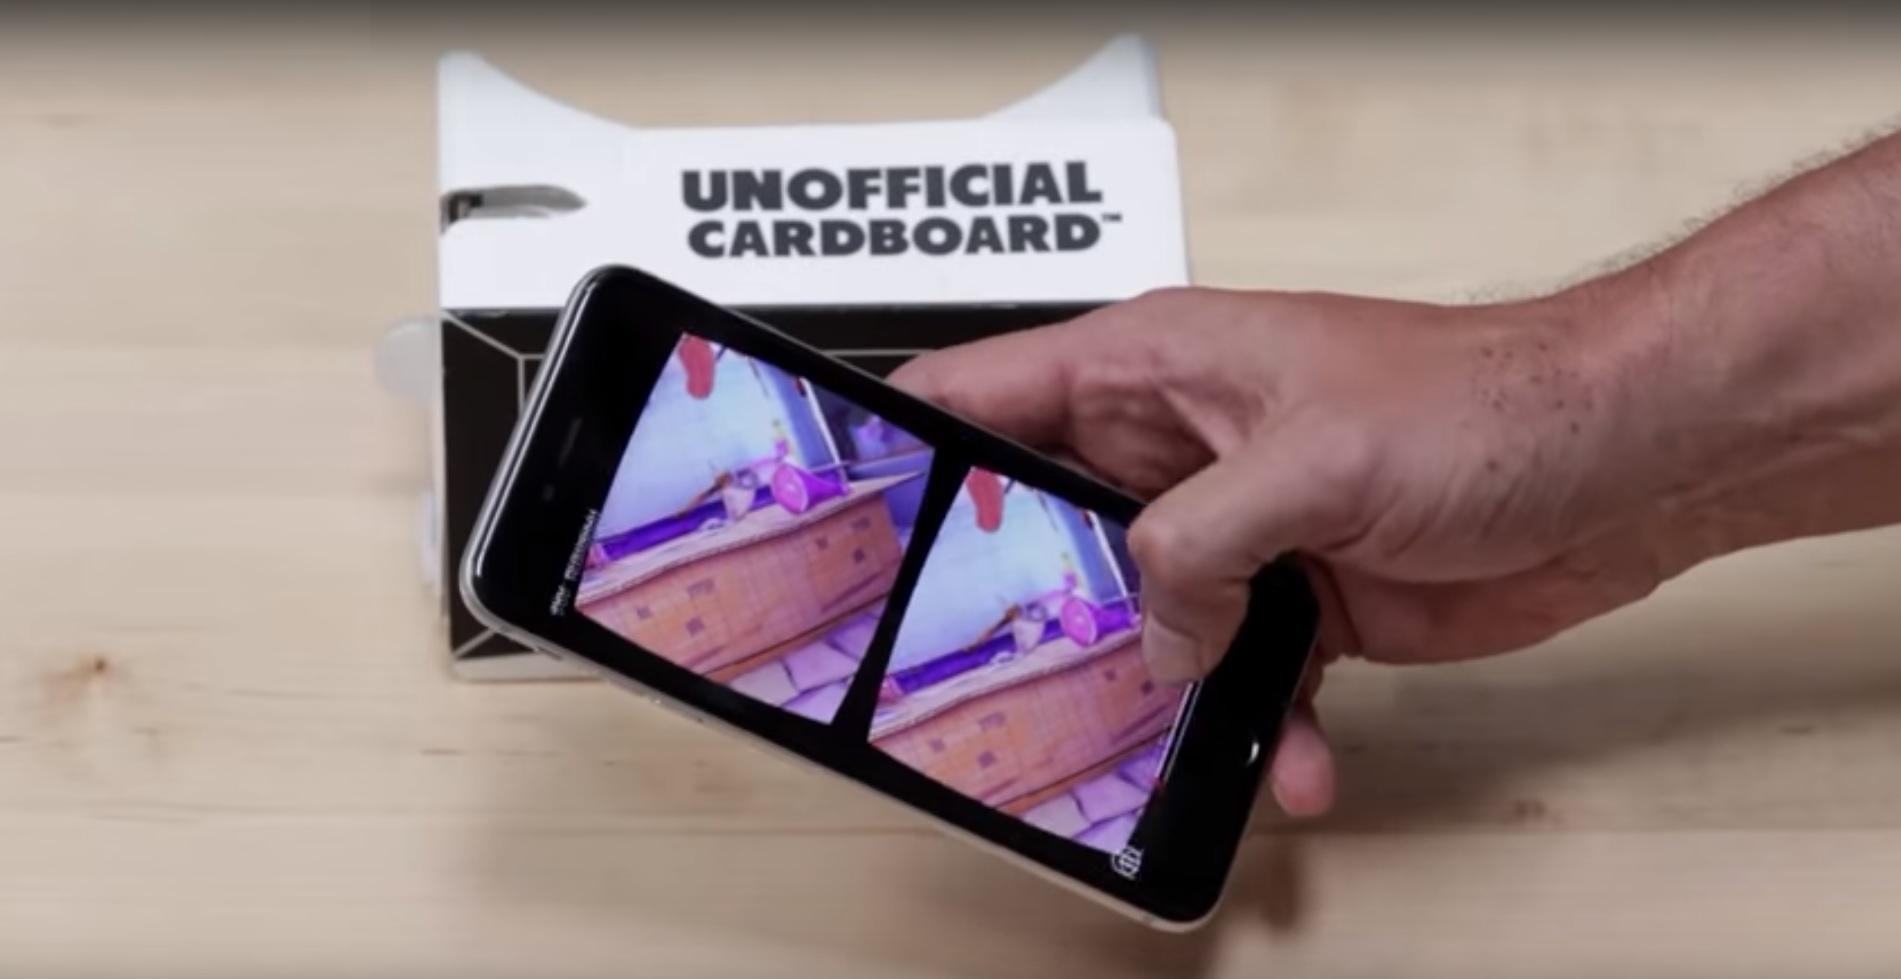 Sony to launch multi-platform VR media service – Hypergrid Business